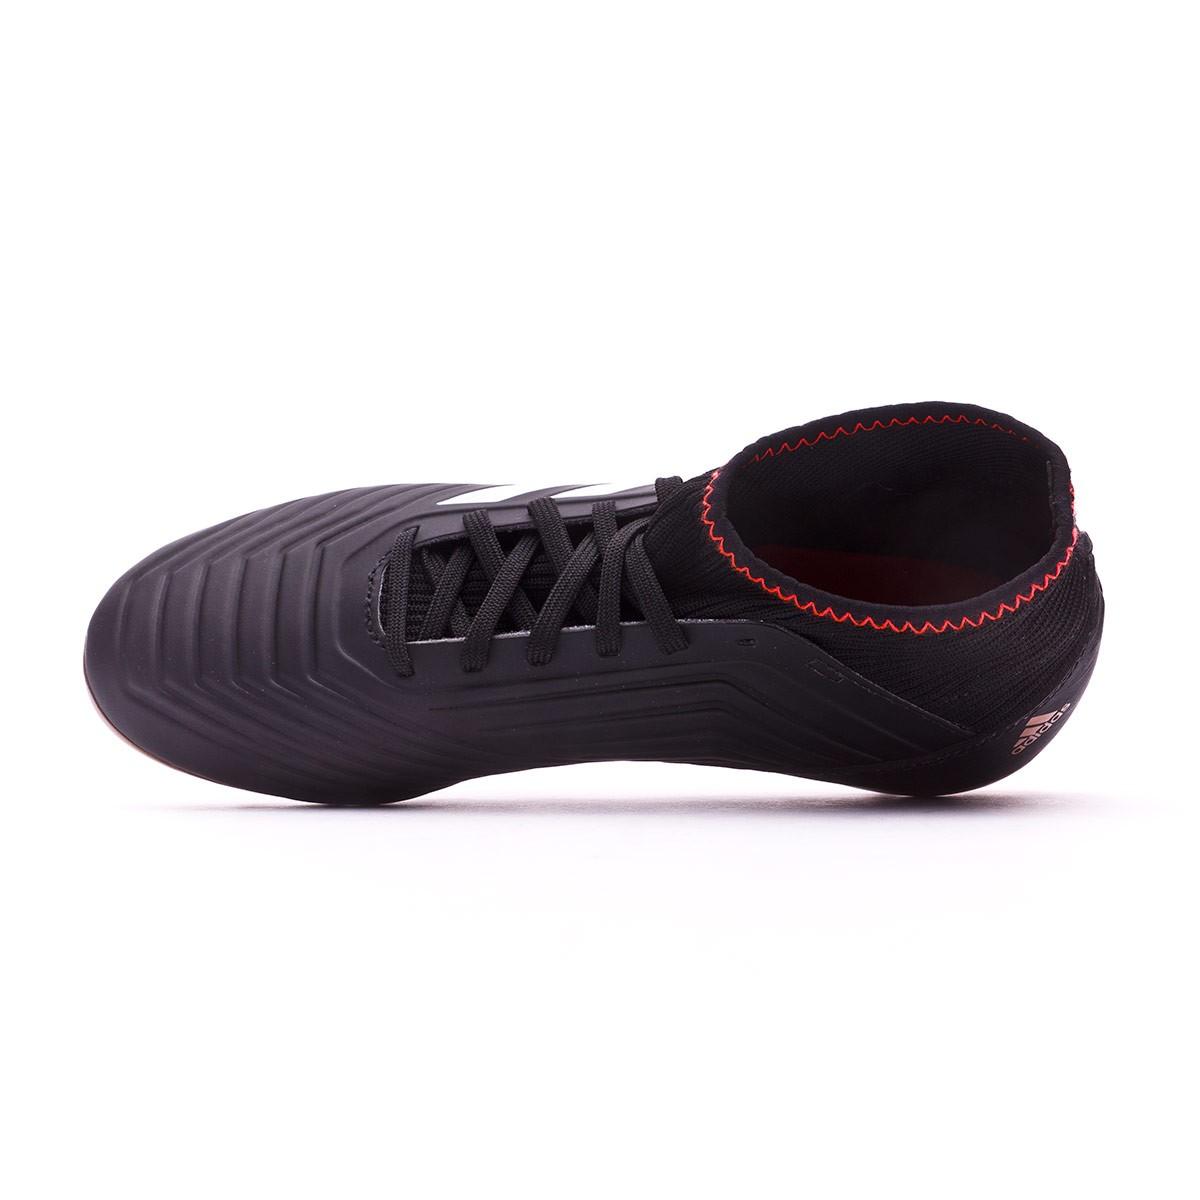 new styles 81add b9b9d Boot adidas Kids Predator 18.3 AG Core black-White-Gold metallic-Solar red  - Leaked soccer